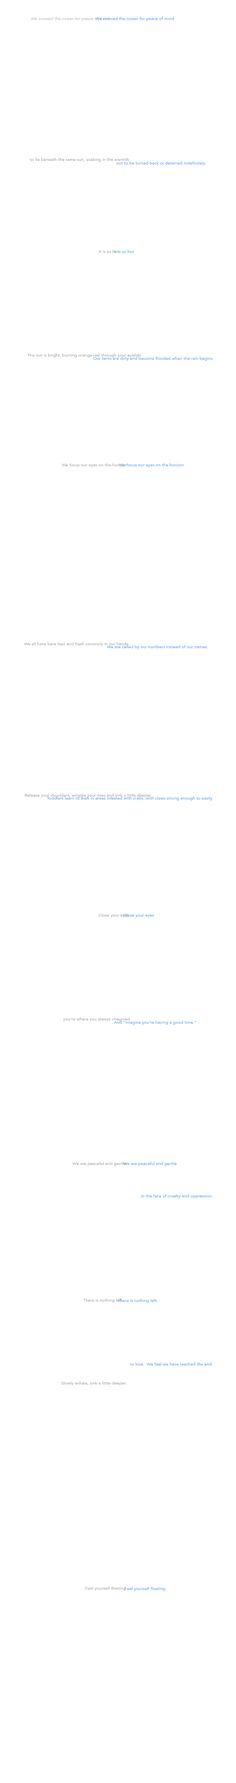 Blank Affidavit Template Form #AffidavitForms Affidavit Form - general affidavit form